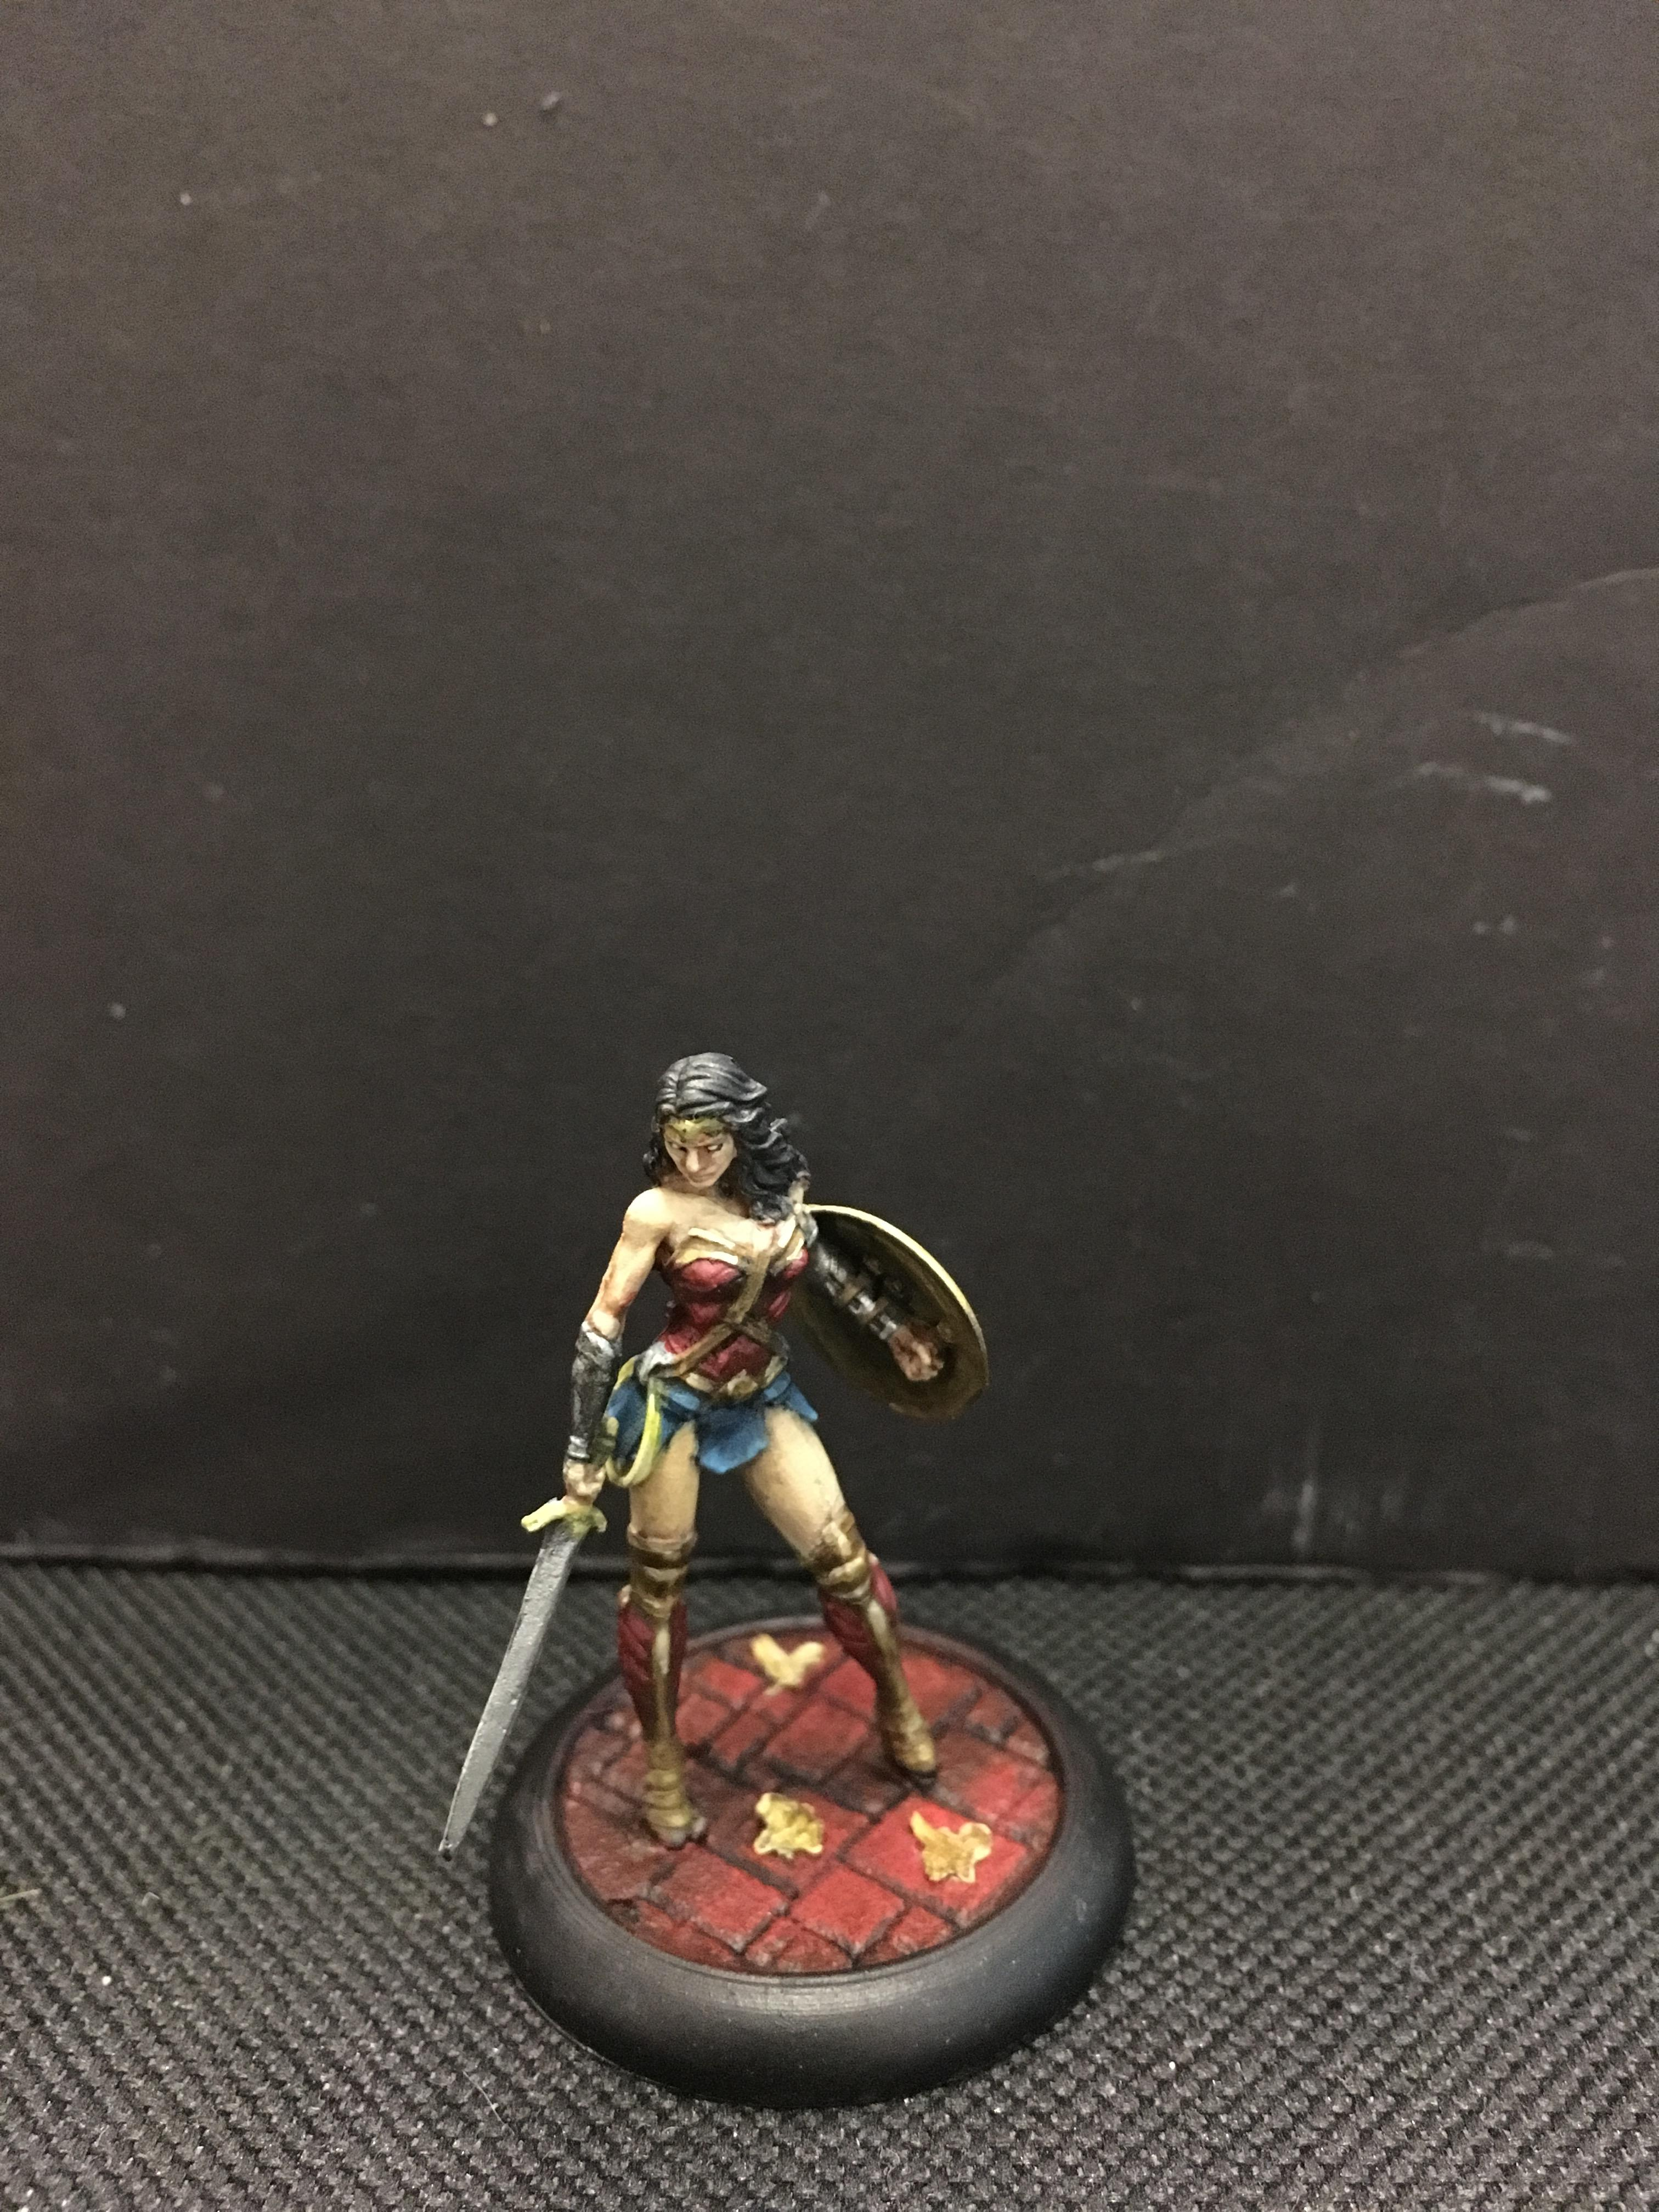 Superhero, Wonder Woman